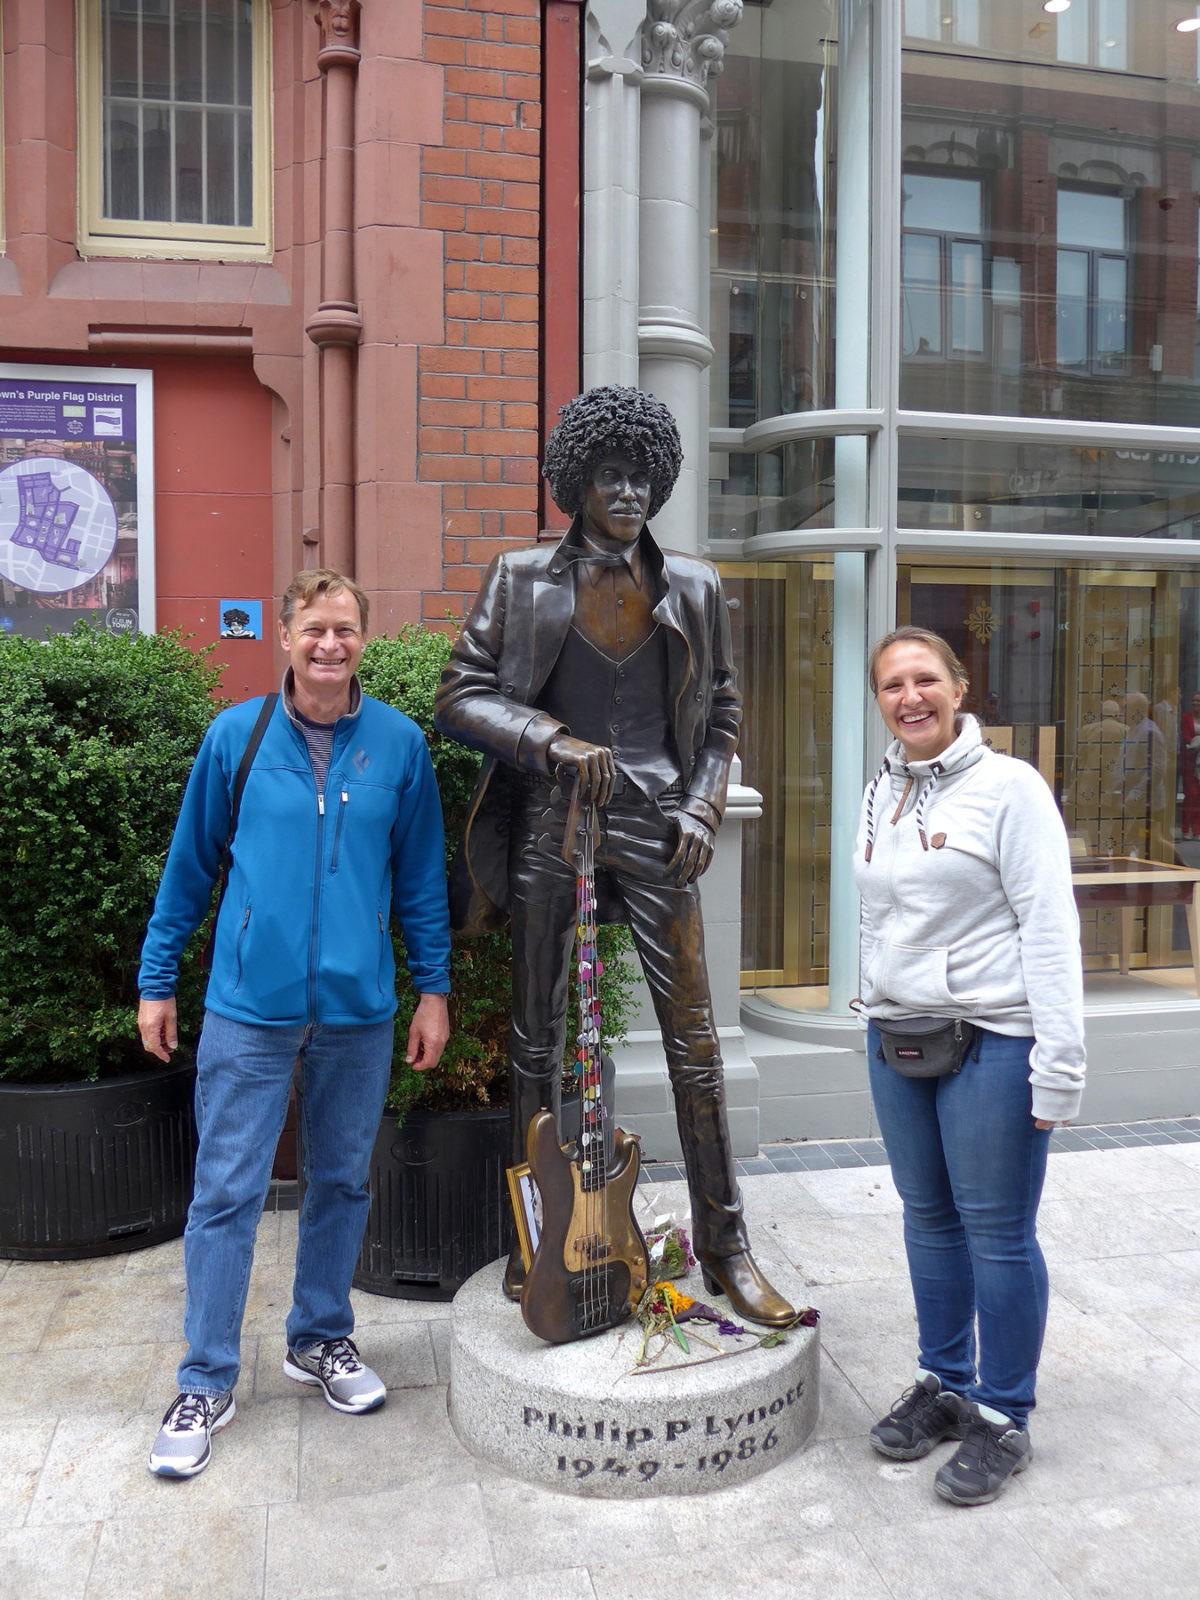 Phil Lynott in Dublin